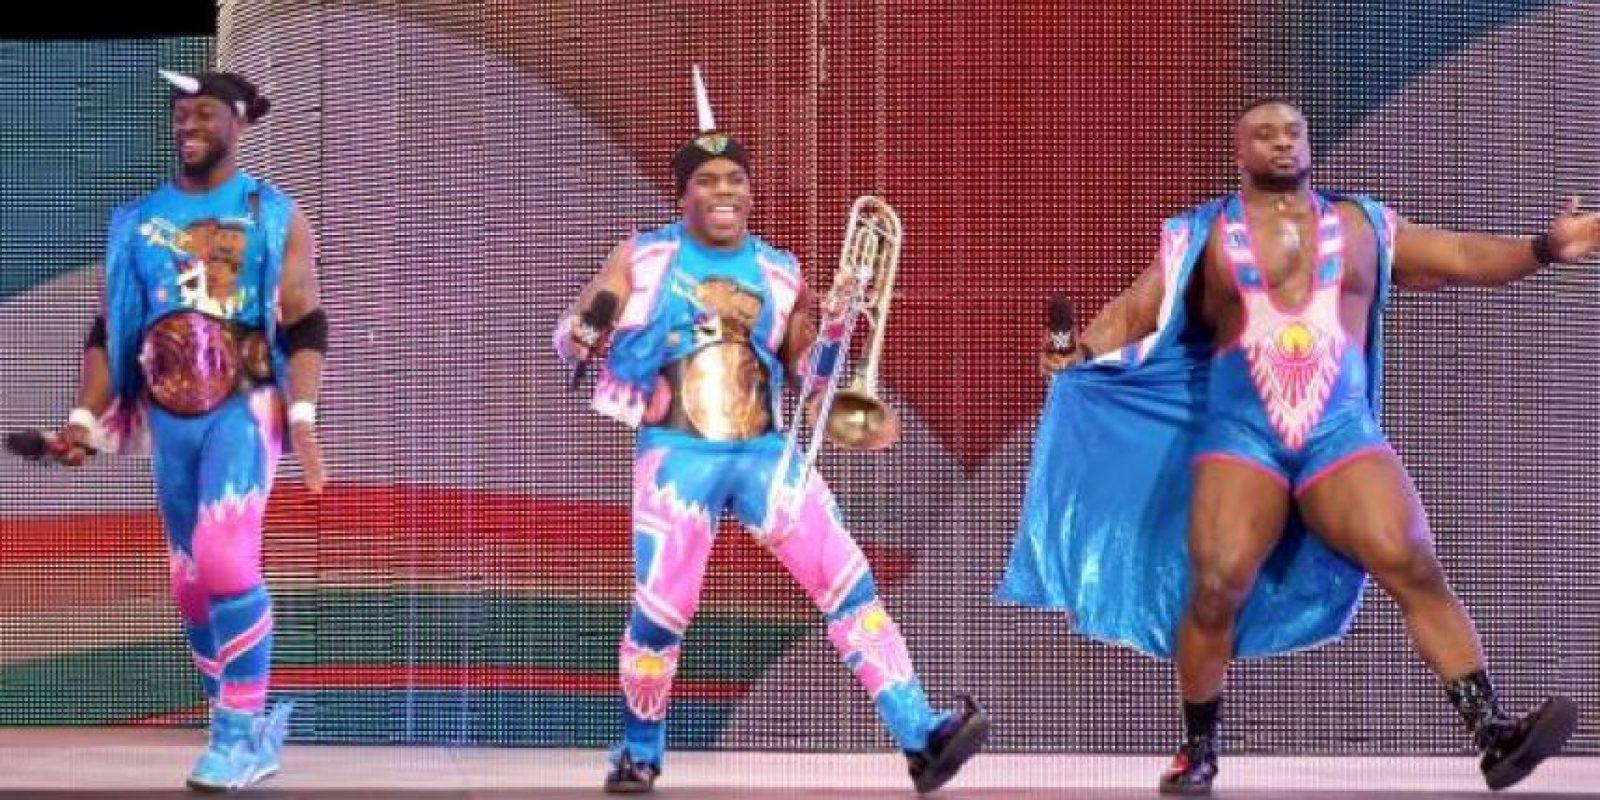 O divertidos como The New Day Foto:WWE